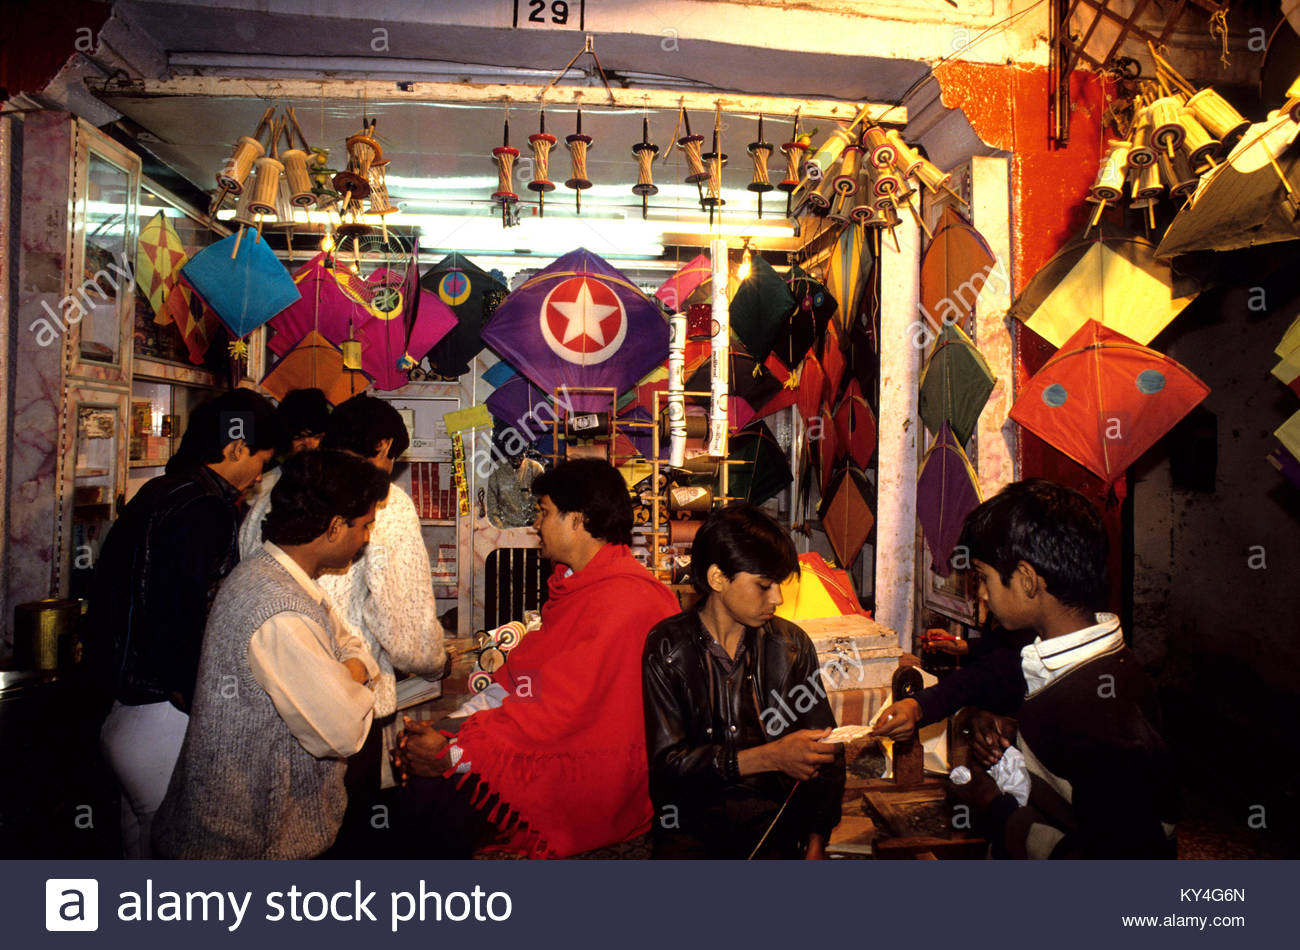 Magasin de cerfs volants a Jaipur, Rajasthan. *** shop in Jaipur, Rajasthan. Stock Photo